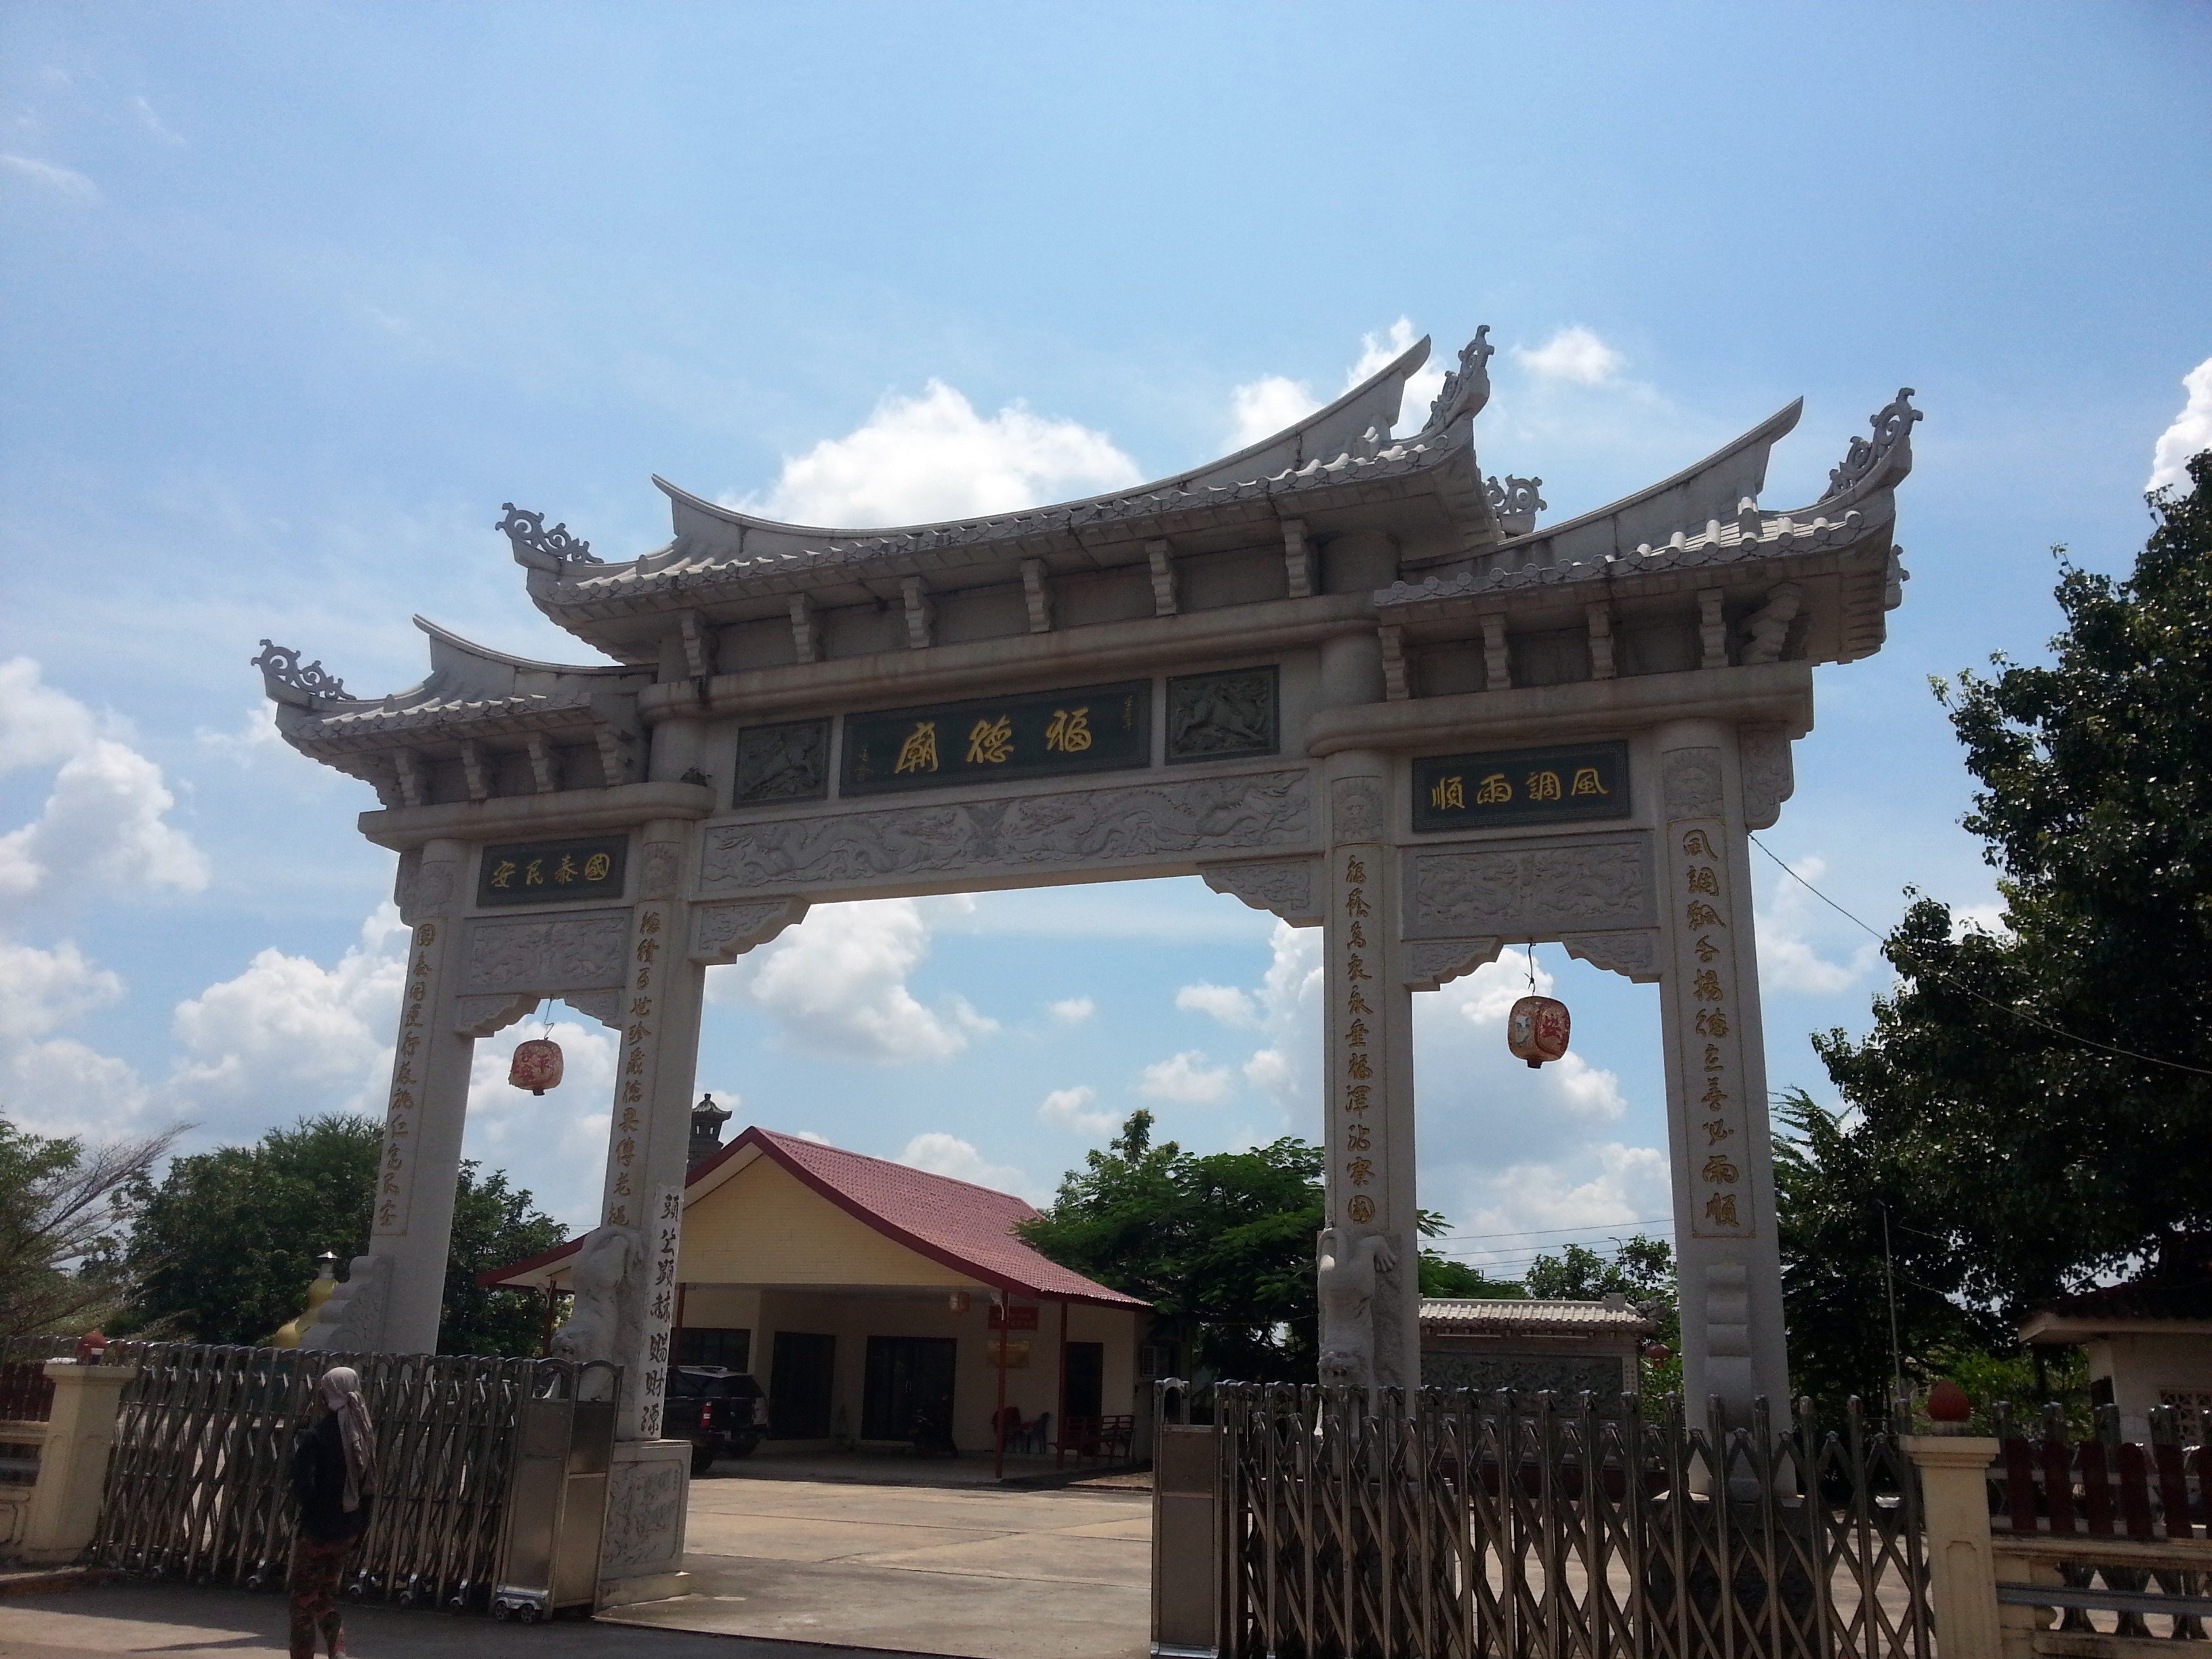 Entrance to the Fude Miao Temple